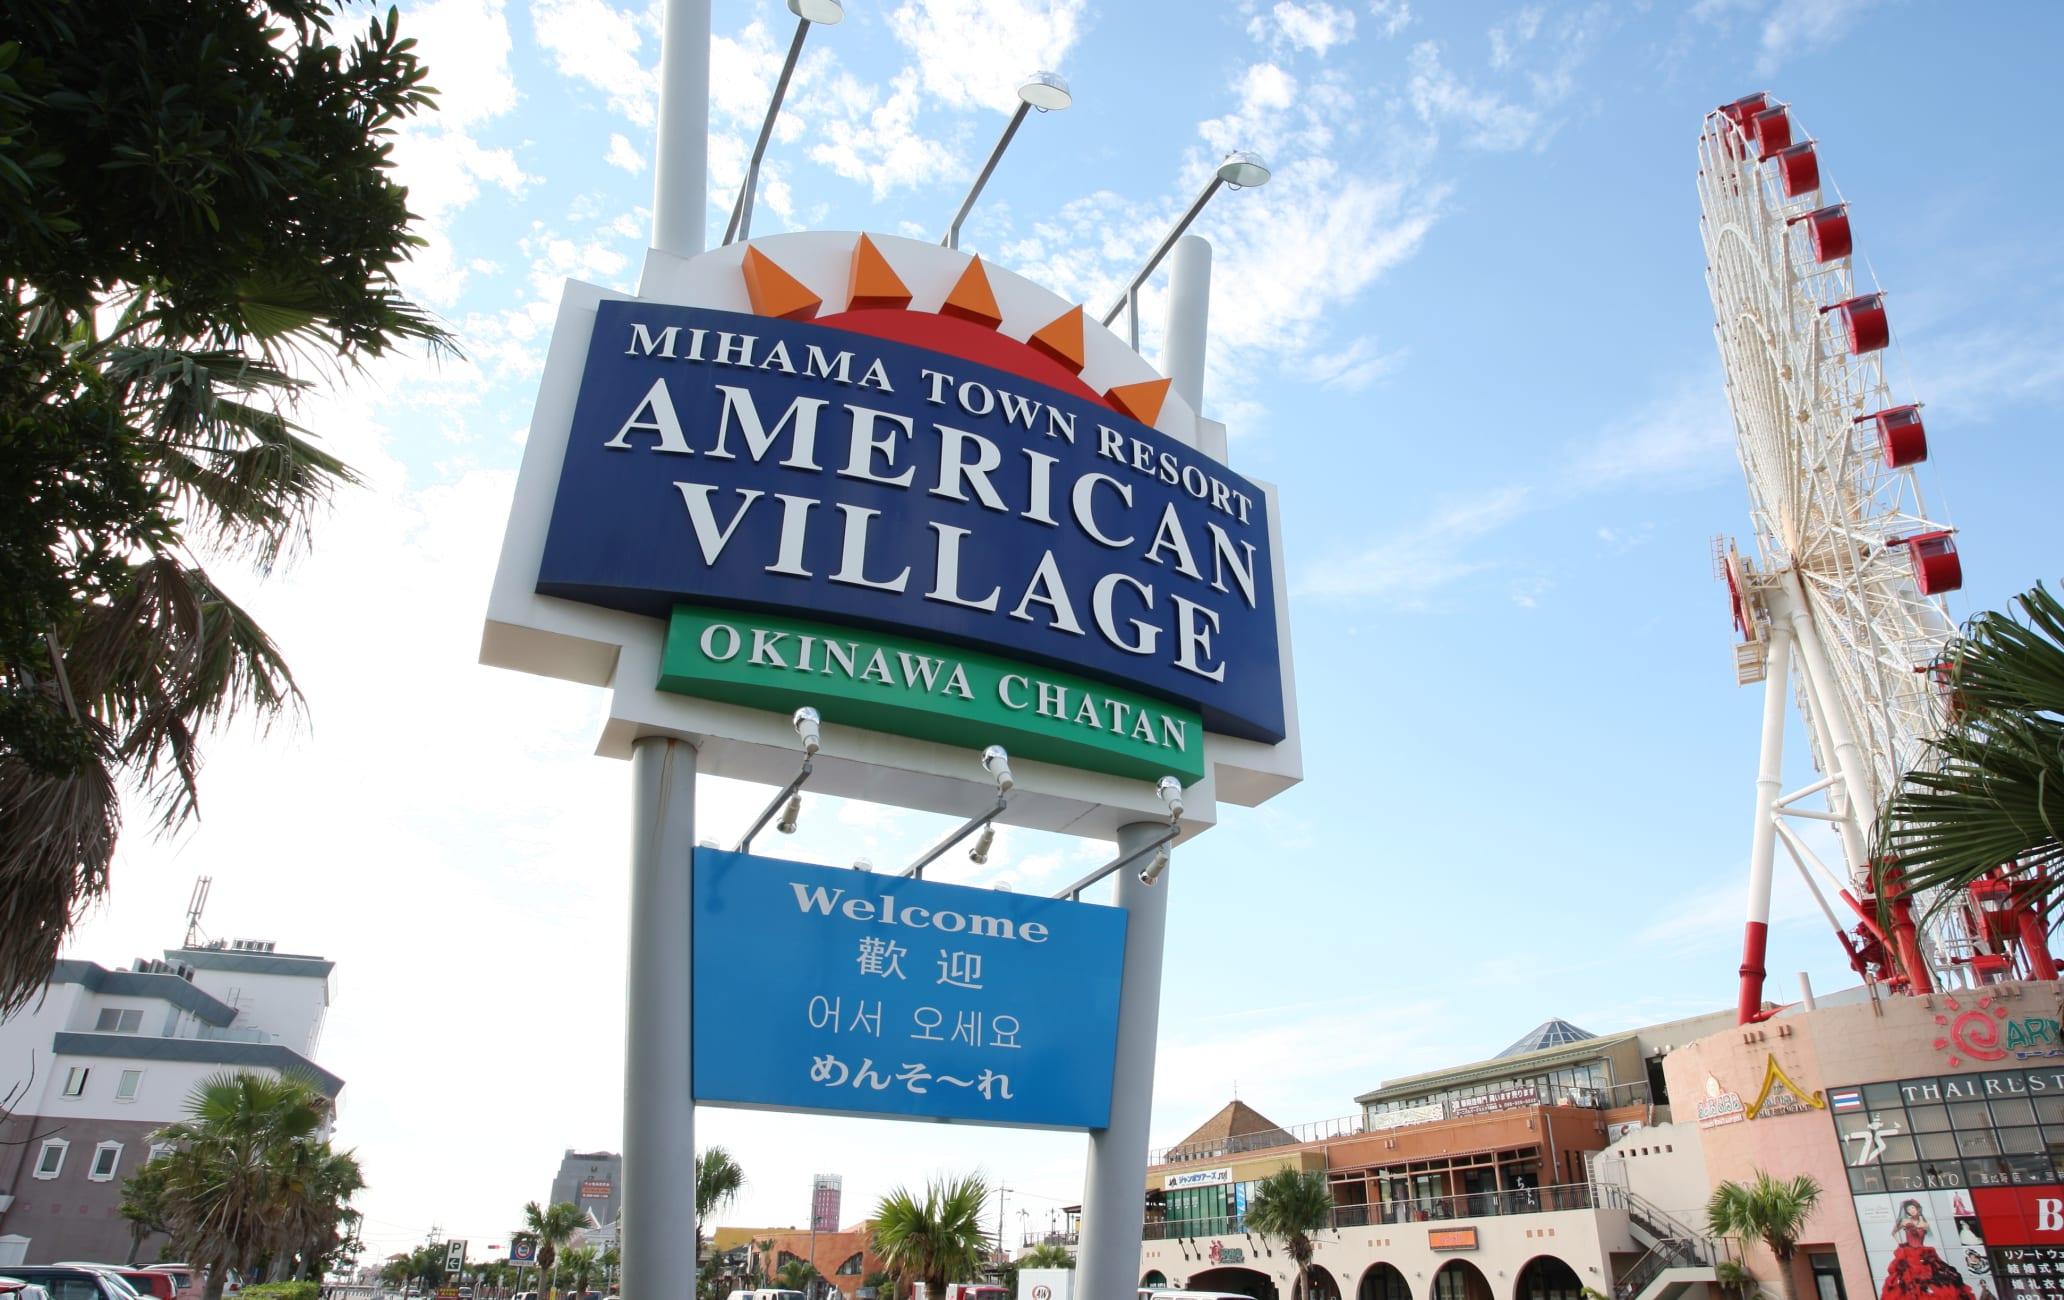 Mihama American Village